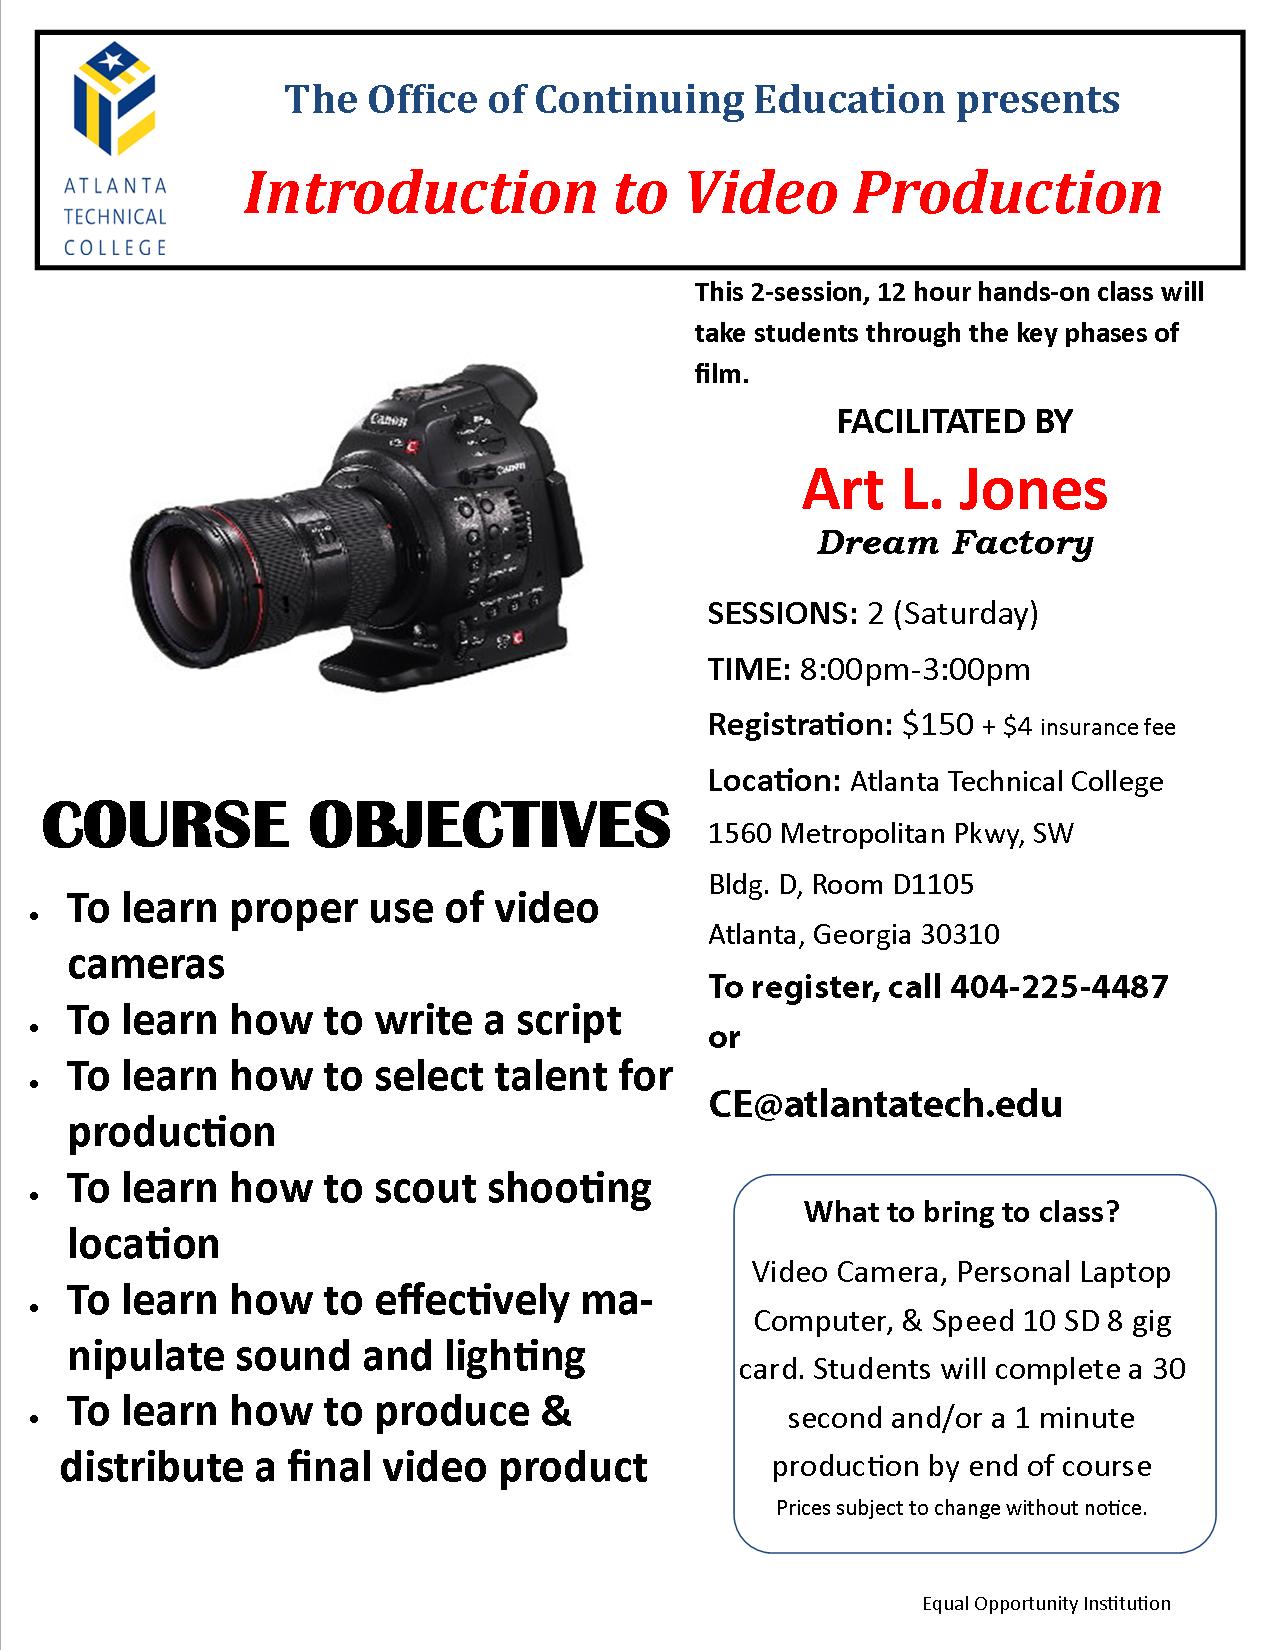 CE Video Production Flyer